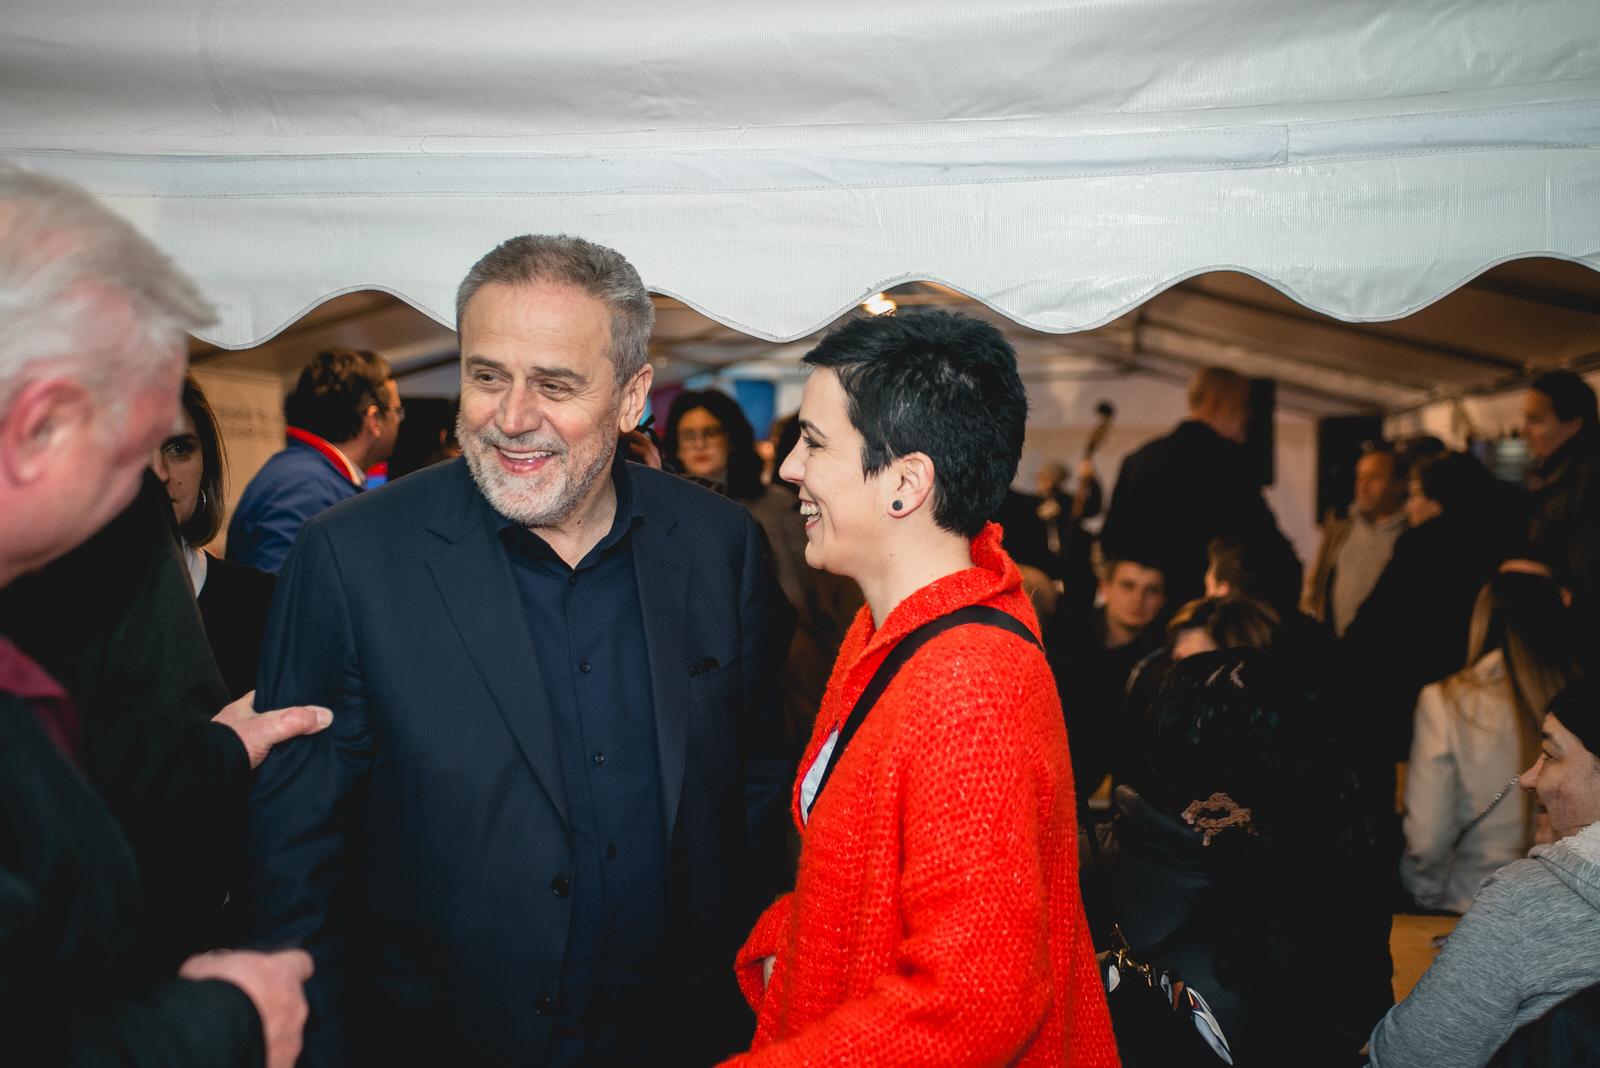 likaclub_milan-bandić-lički-osik_2019-21